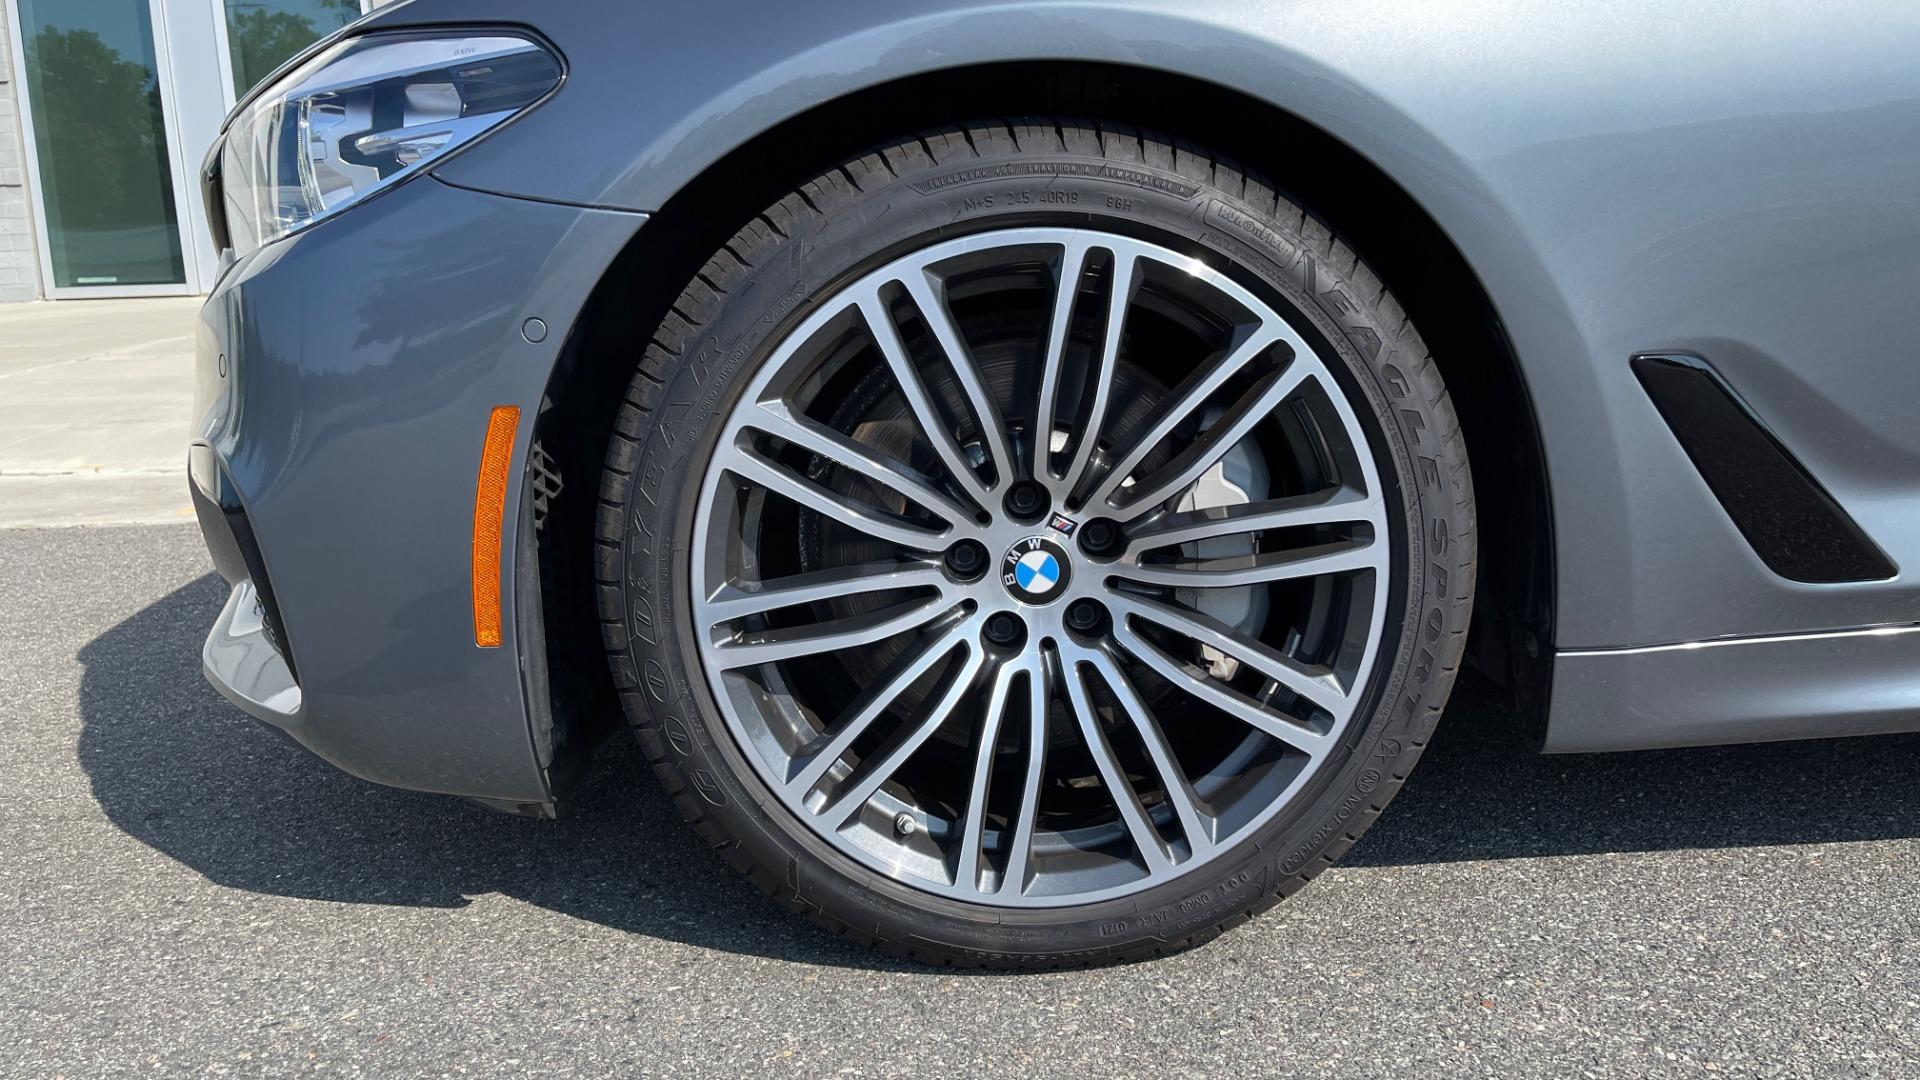 Used 2018 BMW 5 SERIES 540I XDRIVE M-SPORT / DRVR ASST / PDC / APPLE / HUD / H/K SND for sale $42,795 at Formula Imports in Charlotte NC 28227 69